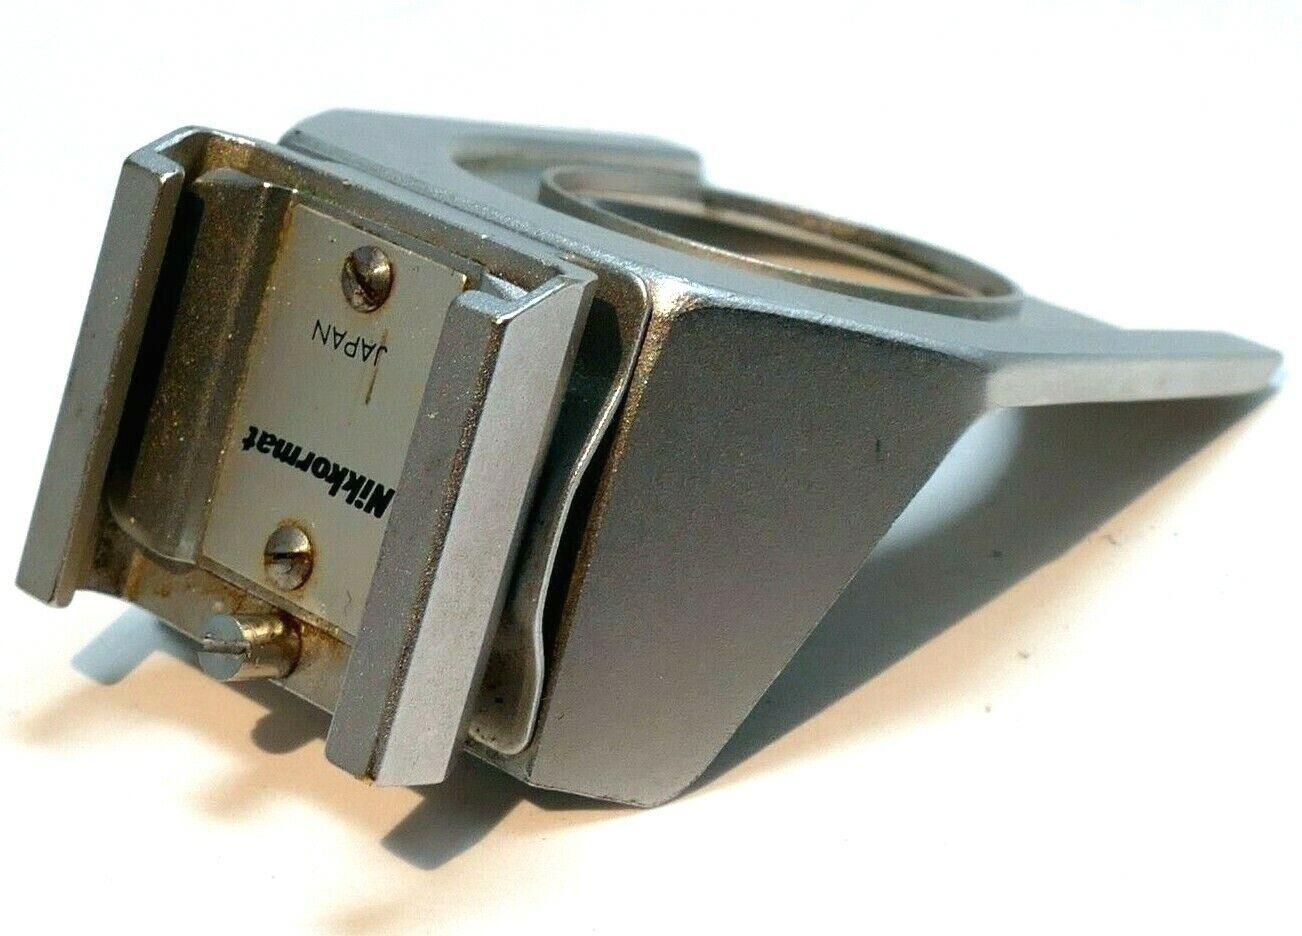 Nikon Accessory shoe Model 2 For Nikkormat flash shoe adapter Ftn FT cameras